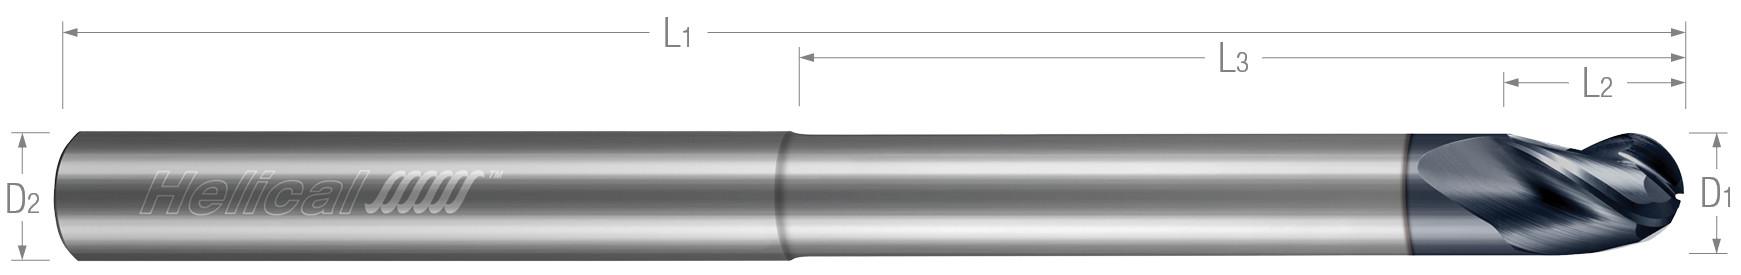 3 Flute, Ball - Reduced Neck (Aplus)